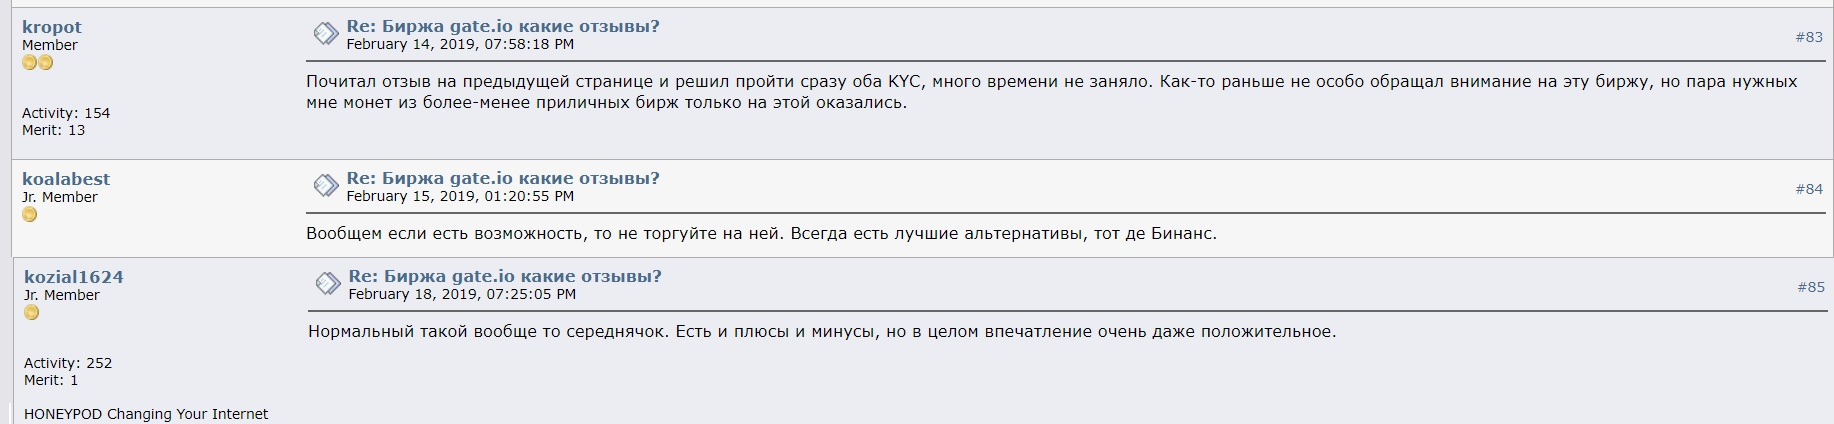 18. Отзывы gate-io 3